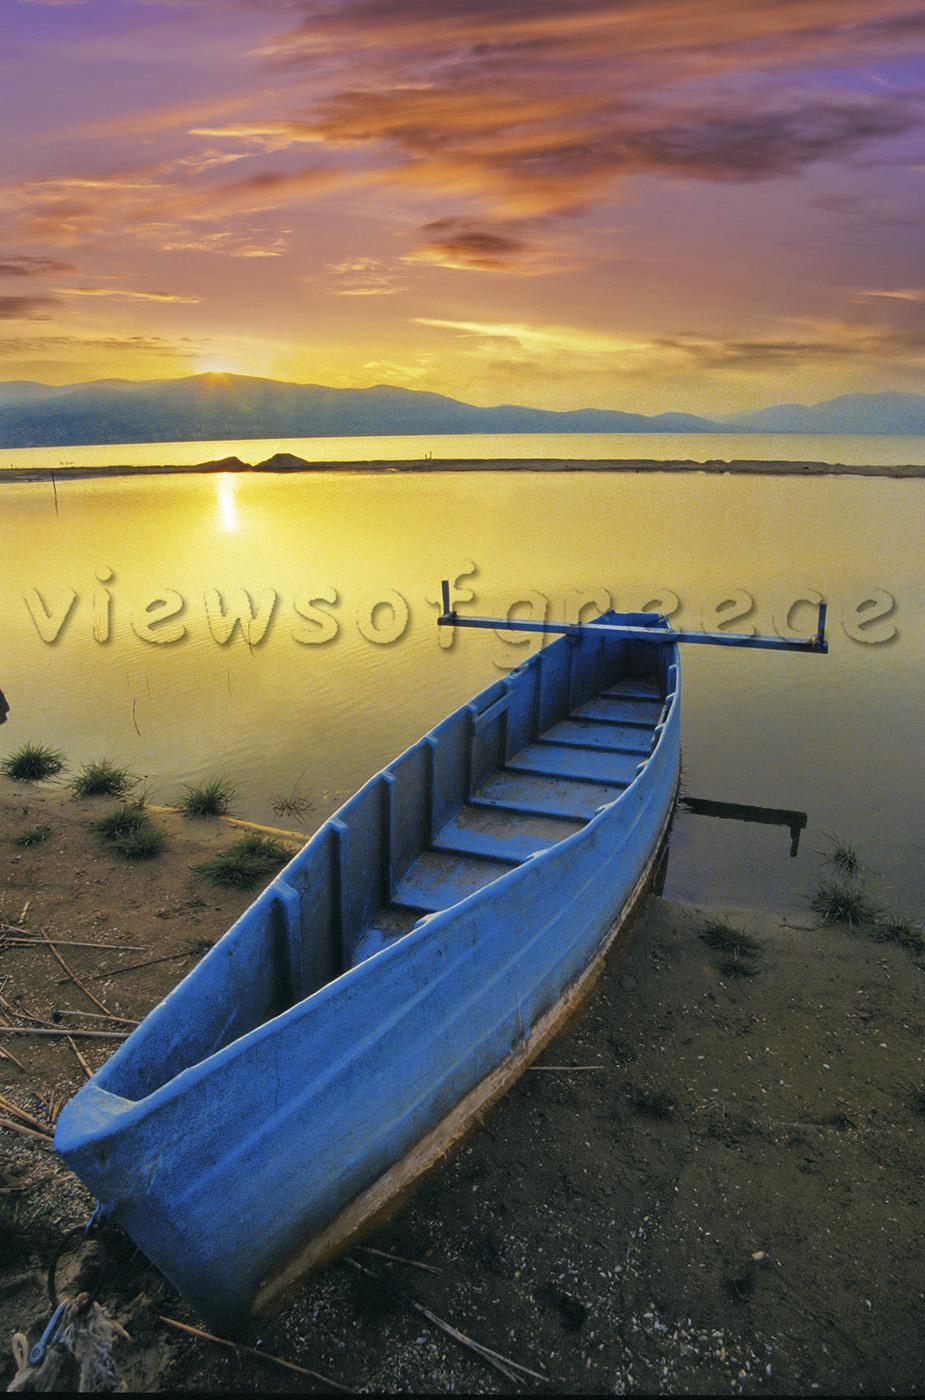 LAKE-DOIRANI-ΛΙΜΝΗ-ΔΟΙΡΑΝΗ-Μυθικό-ηλιοβασίλεμα.